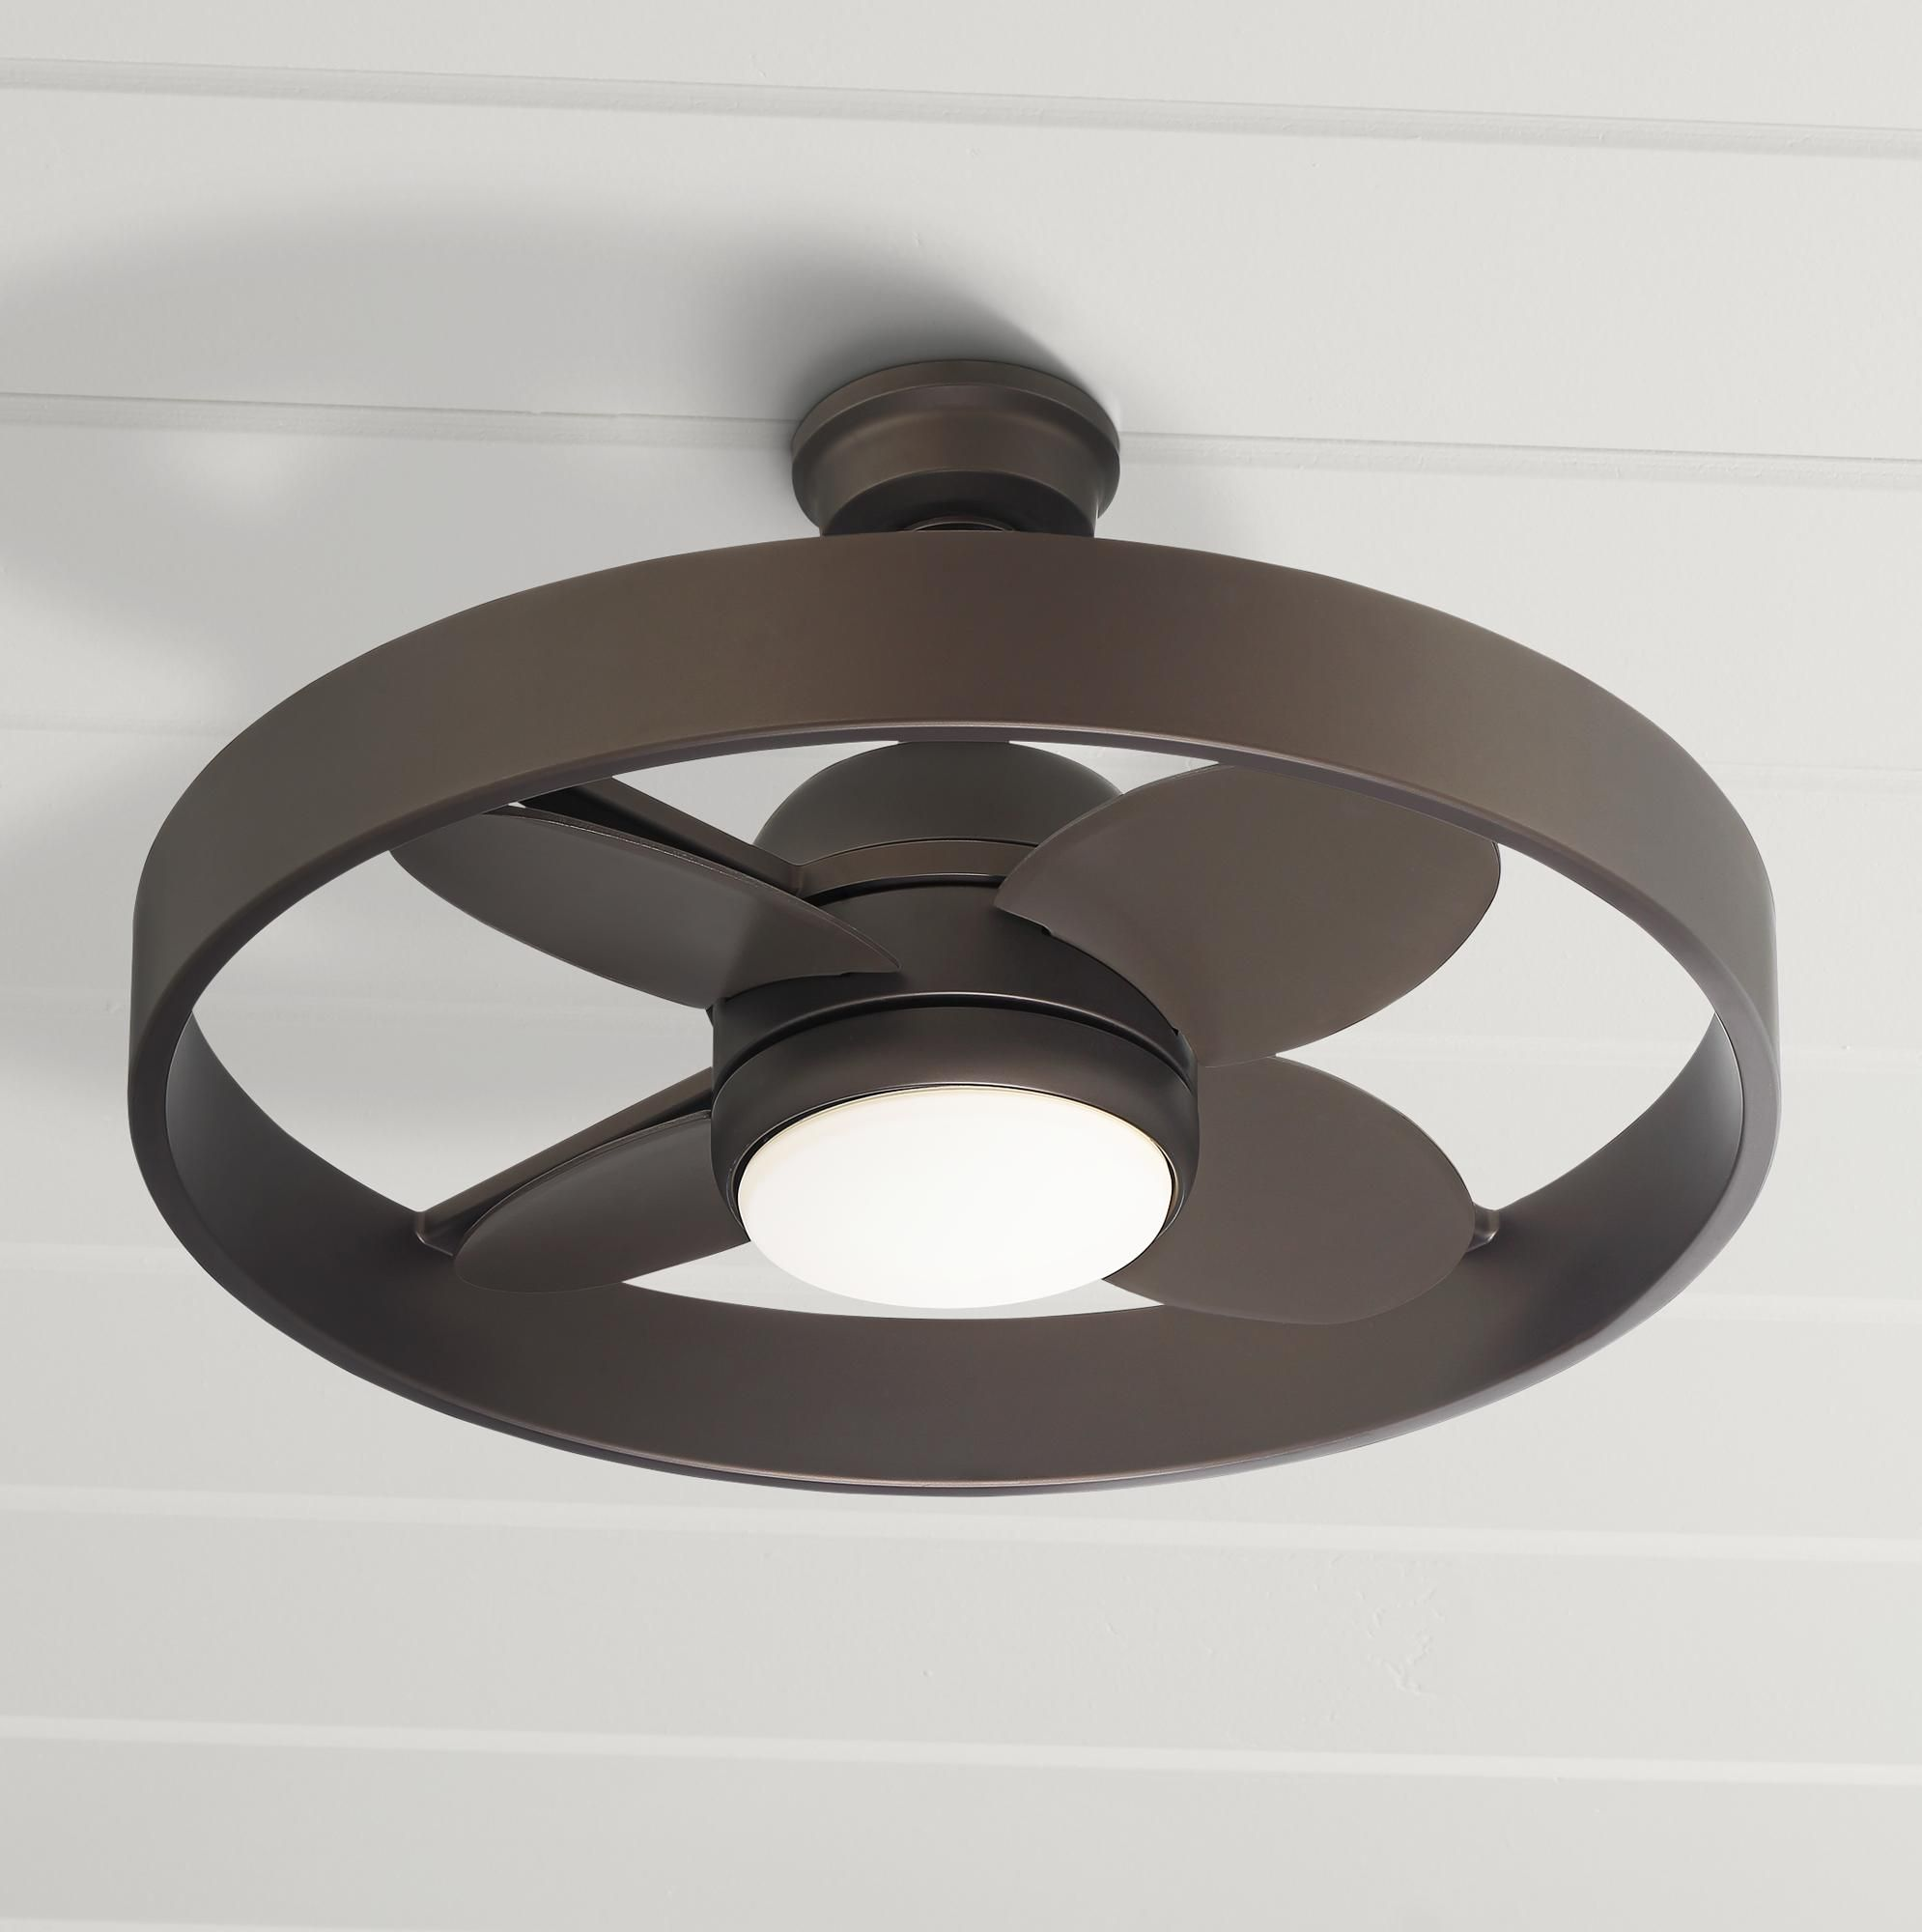 24 Casa Agile Bronze Circle Damp Rated Led Ceiling Fan Ceiling Fan Led Ceiling Fan Ceiling 24 inch ceiling fan